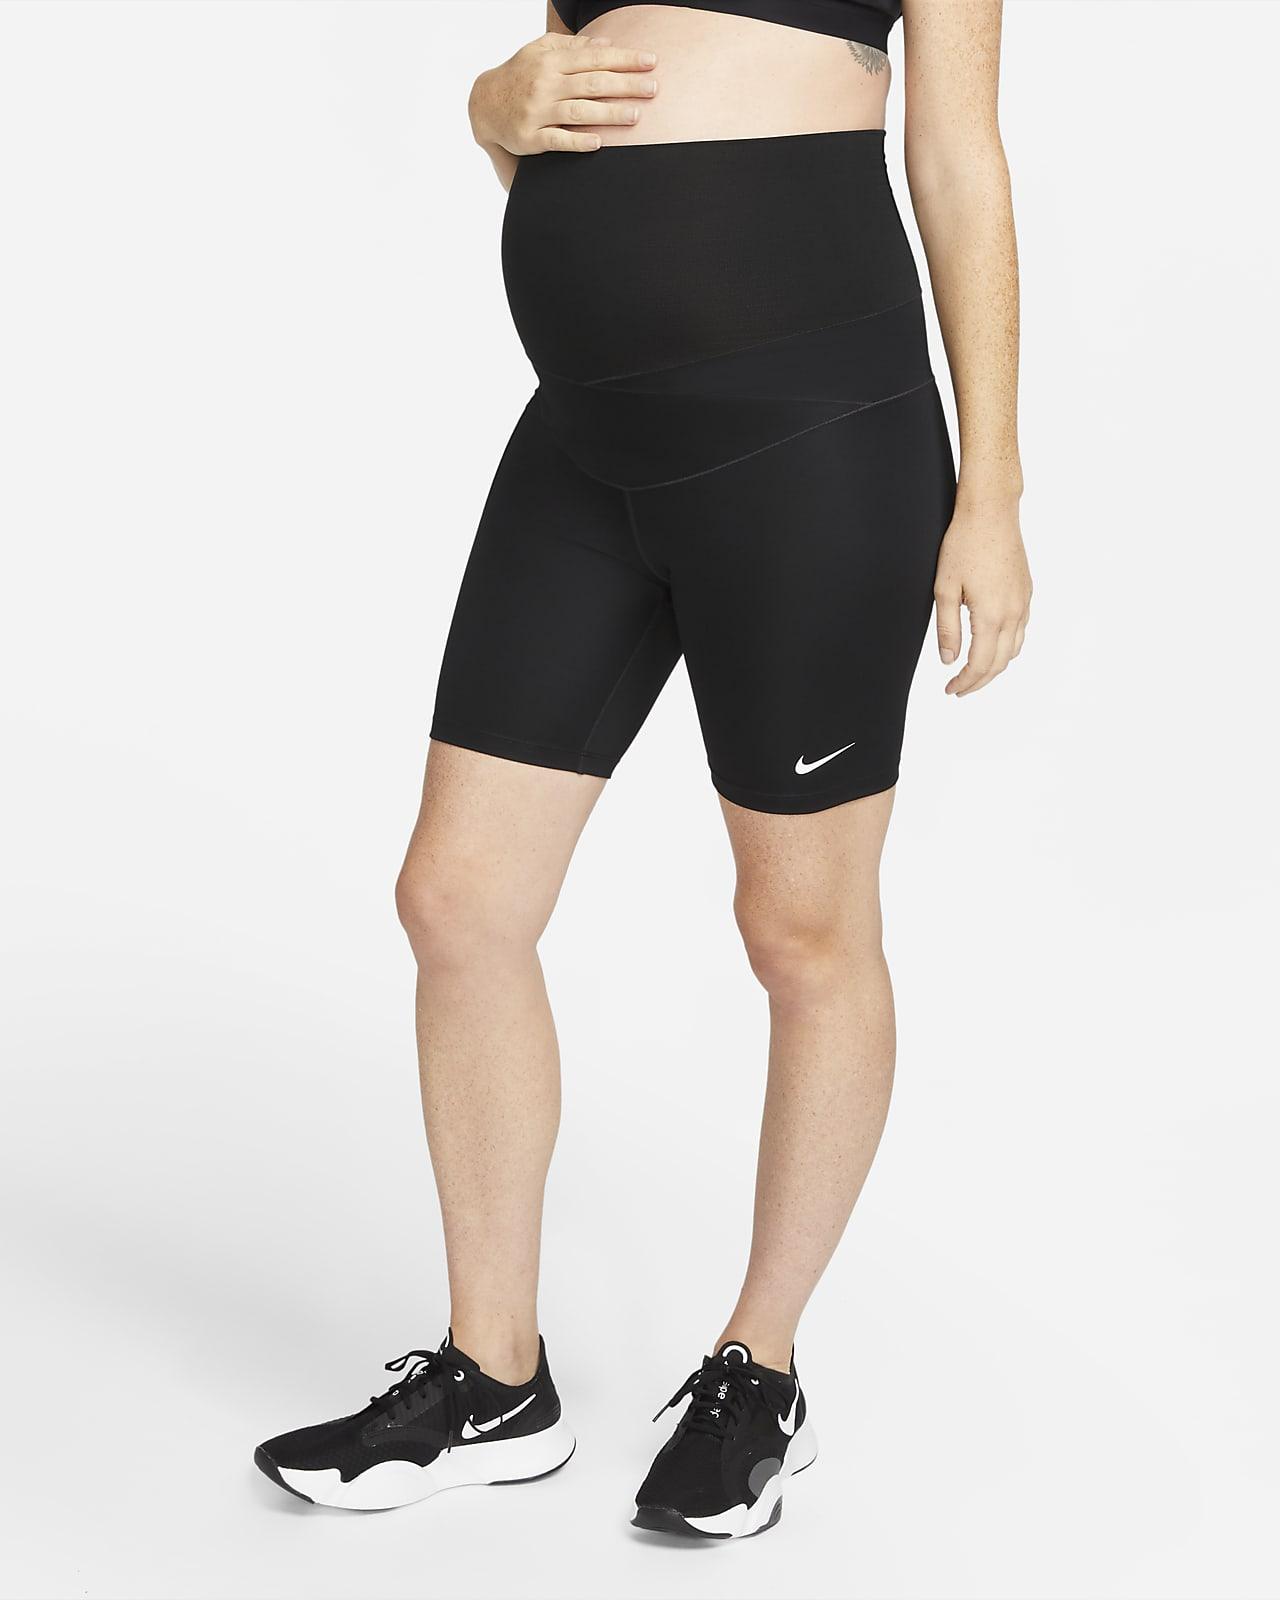 Shorts de maternidad de 17,8 cm para mujer Nike One (M) Dri-FIT